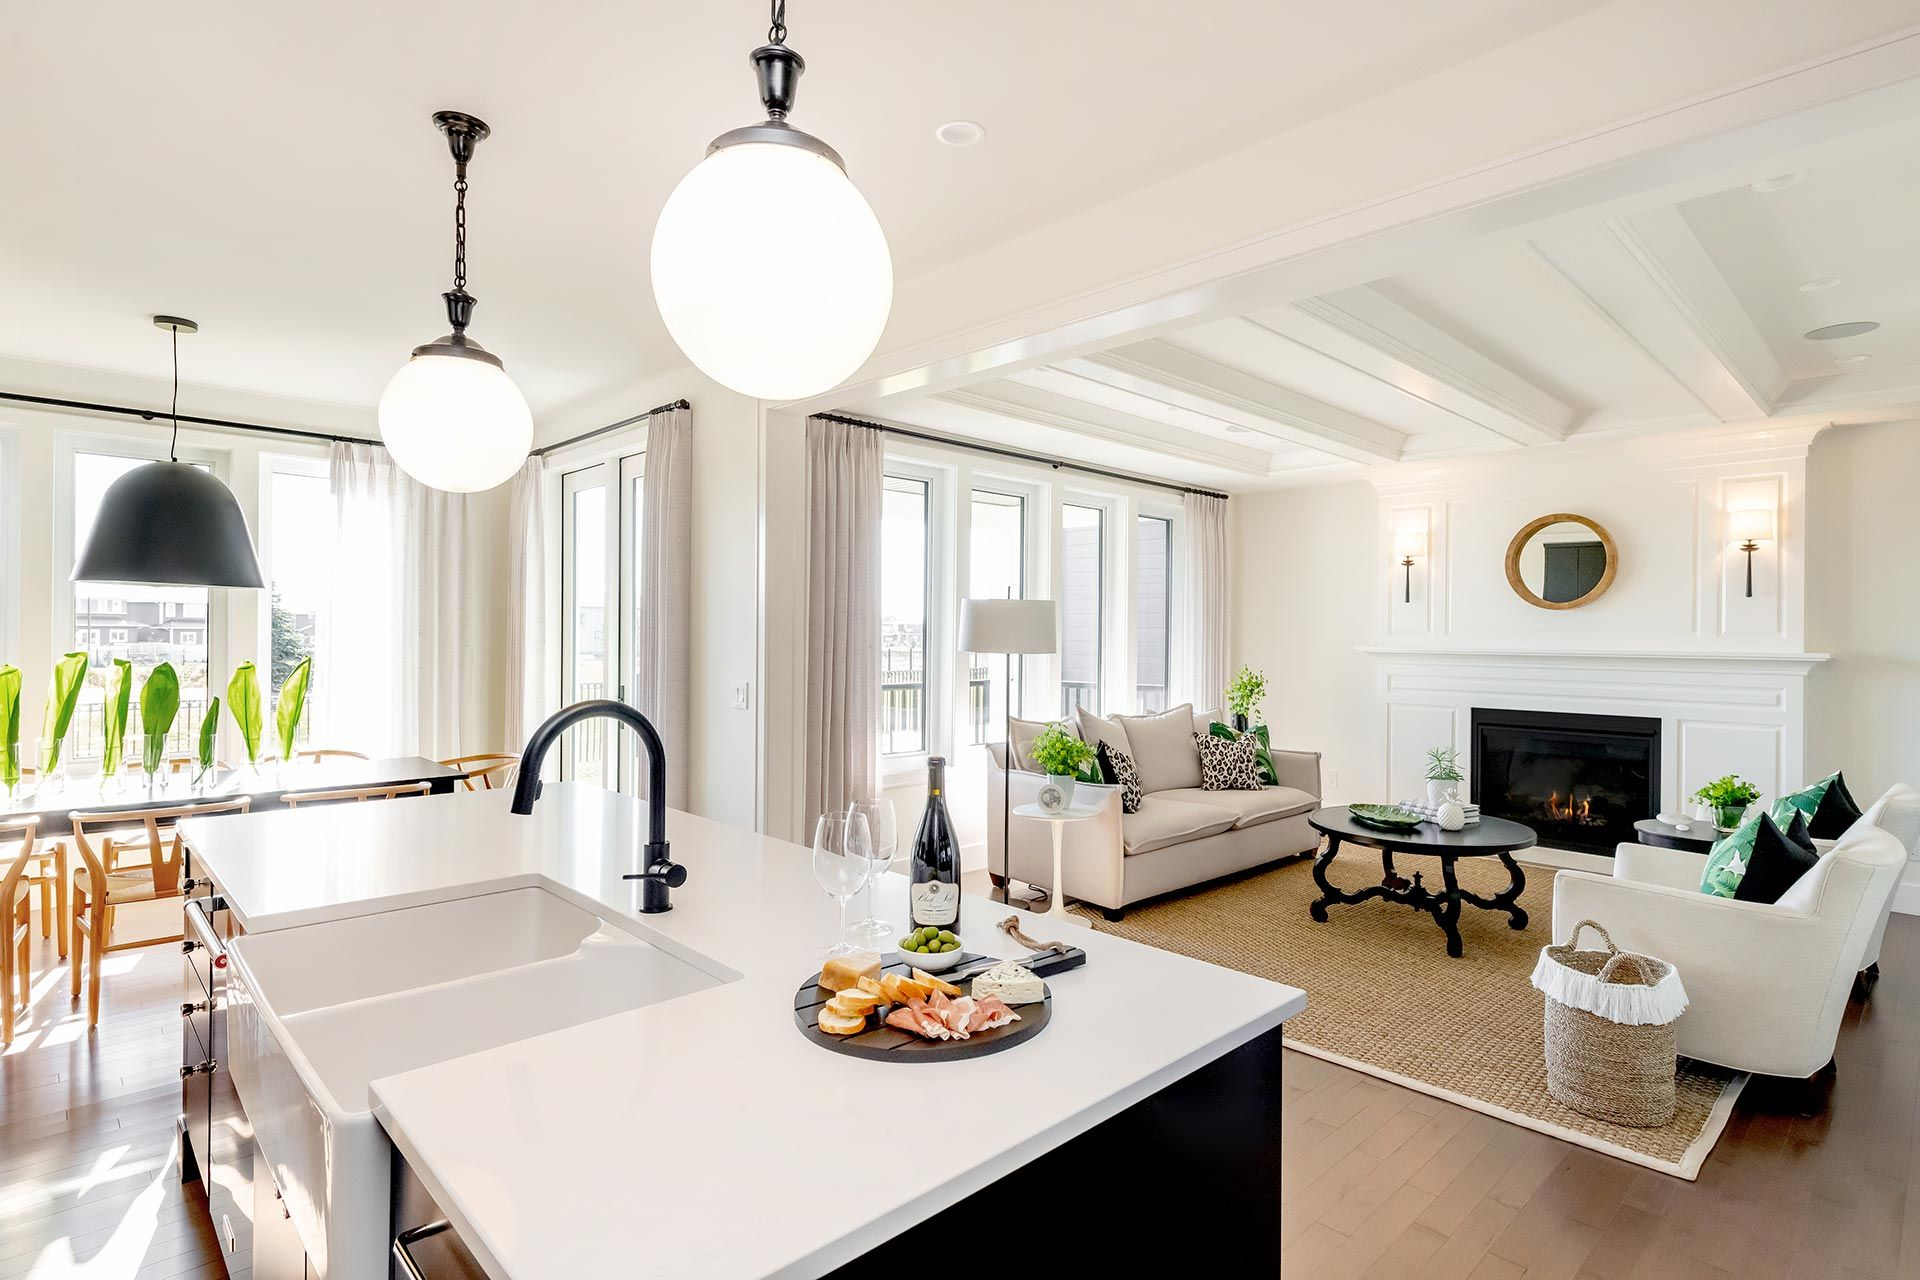 Home | Maison Design Build